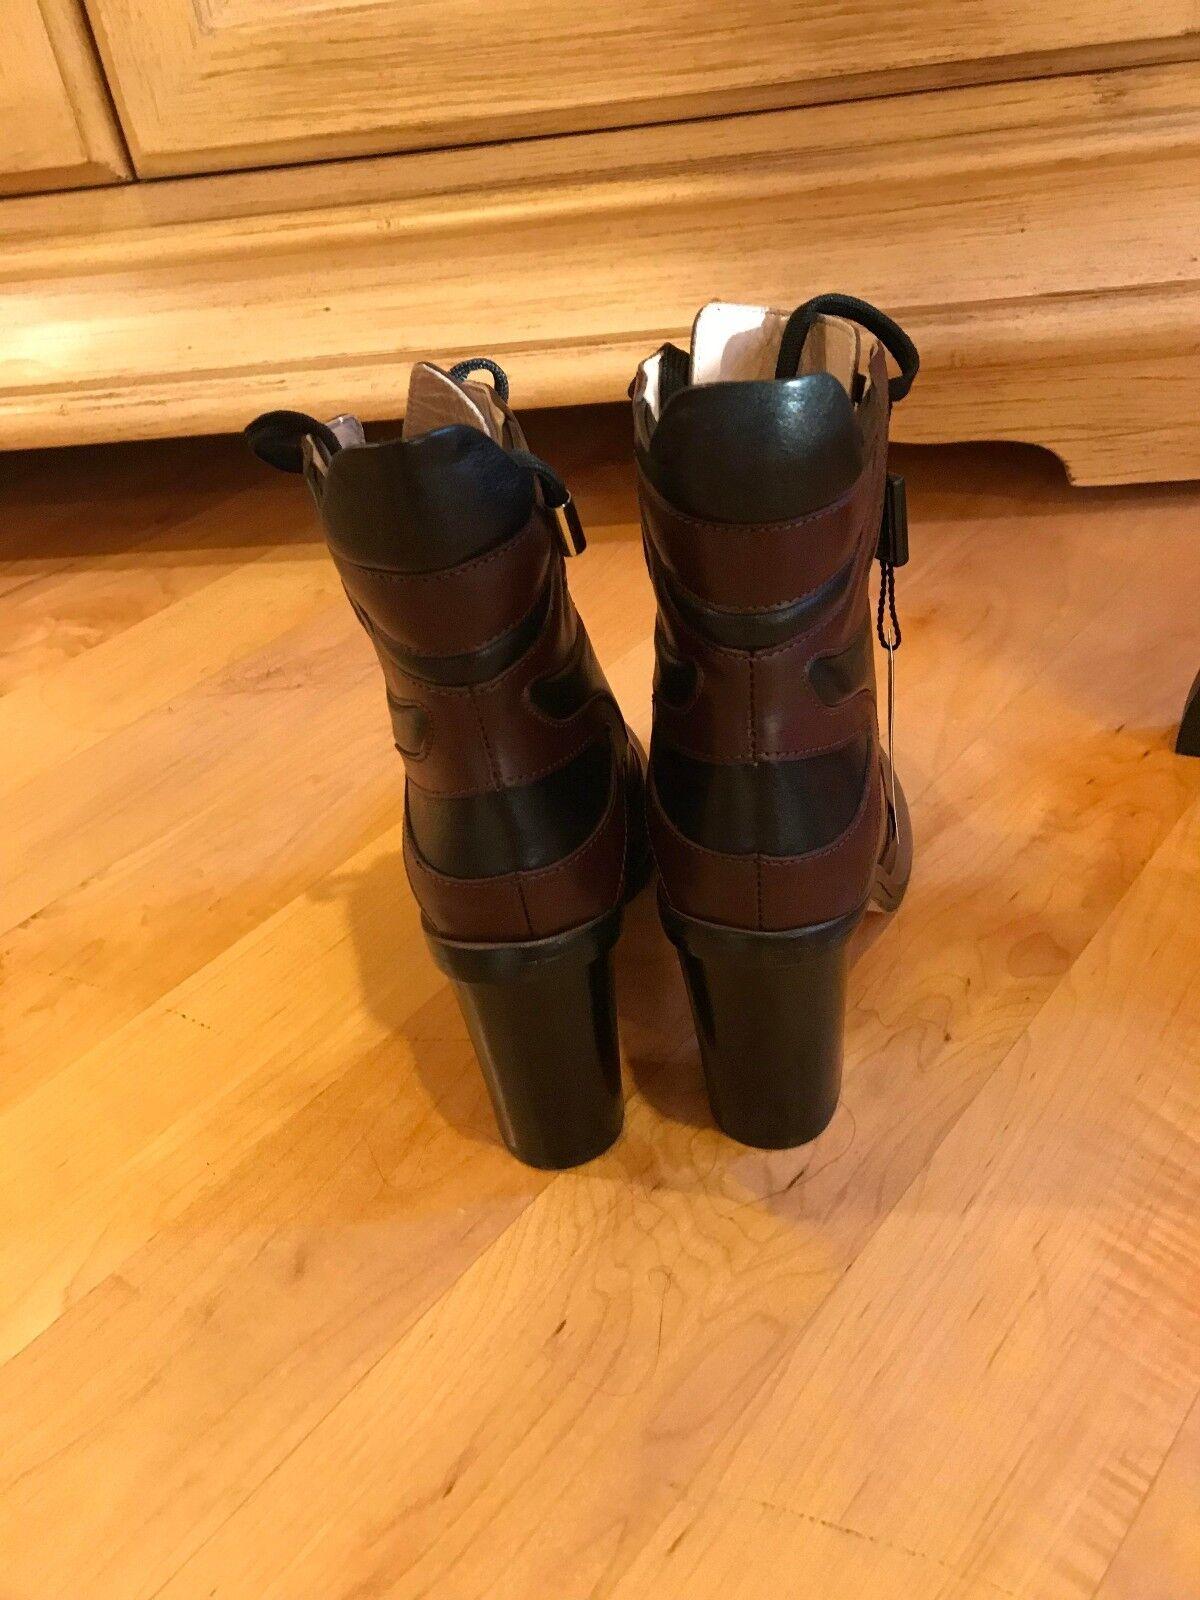 Damenschuhe Cavallini Leder Hand Made in  Ankle Stiefel 6 Größe 6 Stiefel NEW d97e99